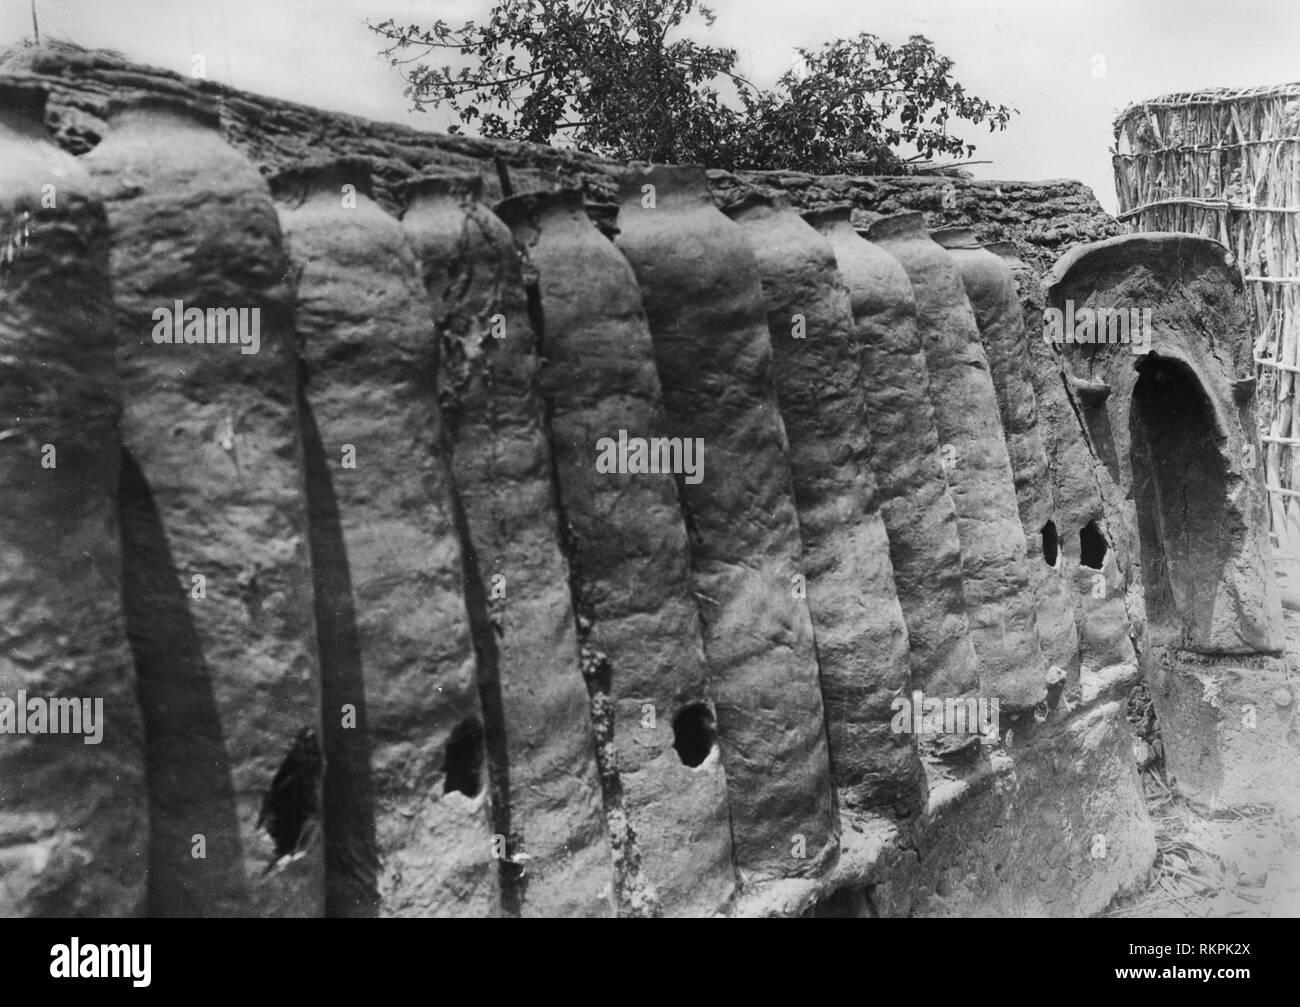 barns, rhodesia, africa 1920 1930 - Stock Image